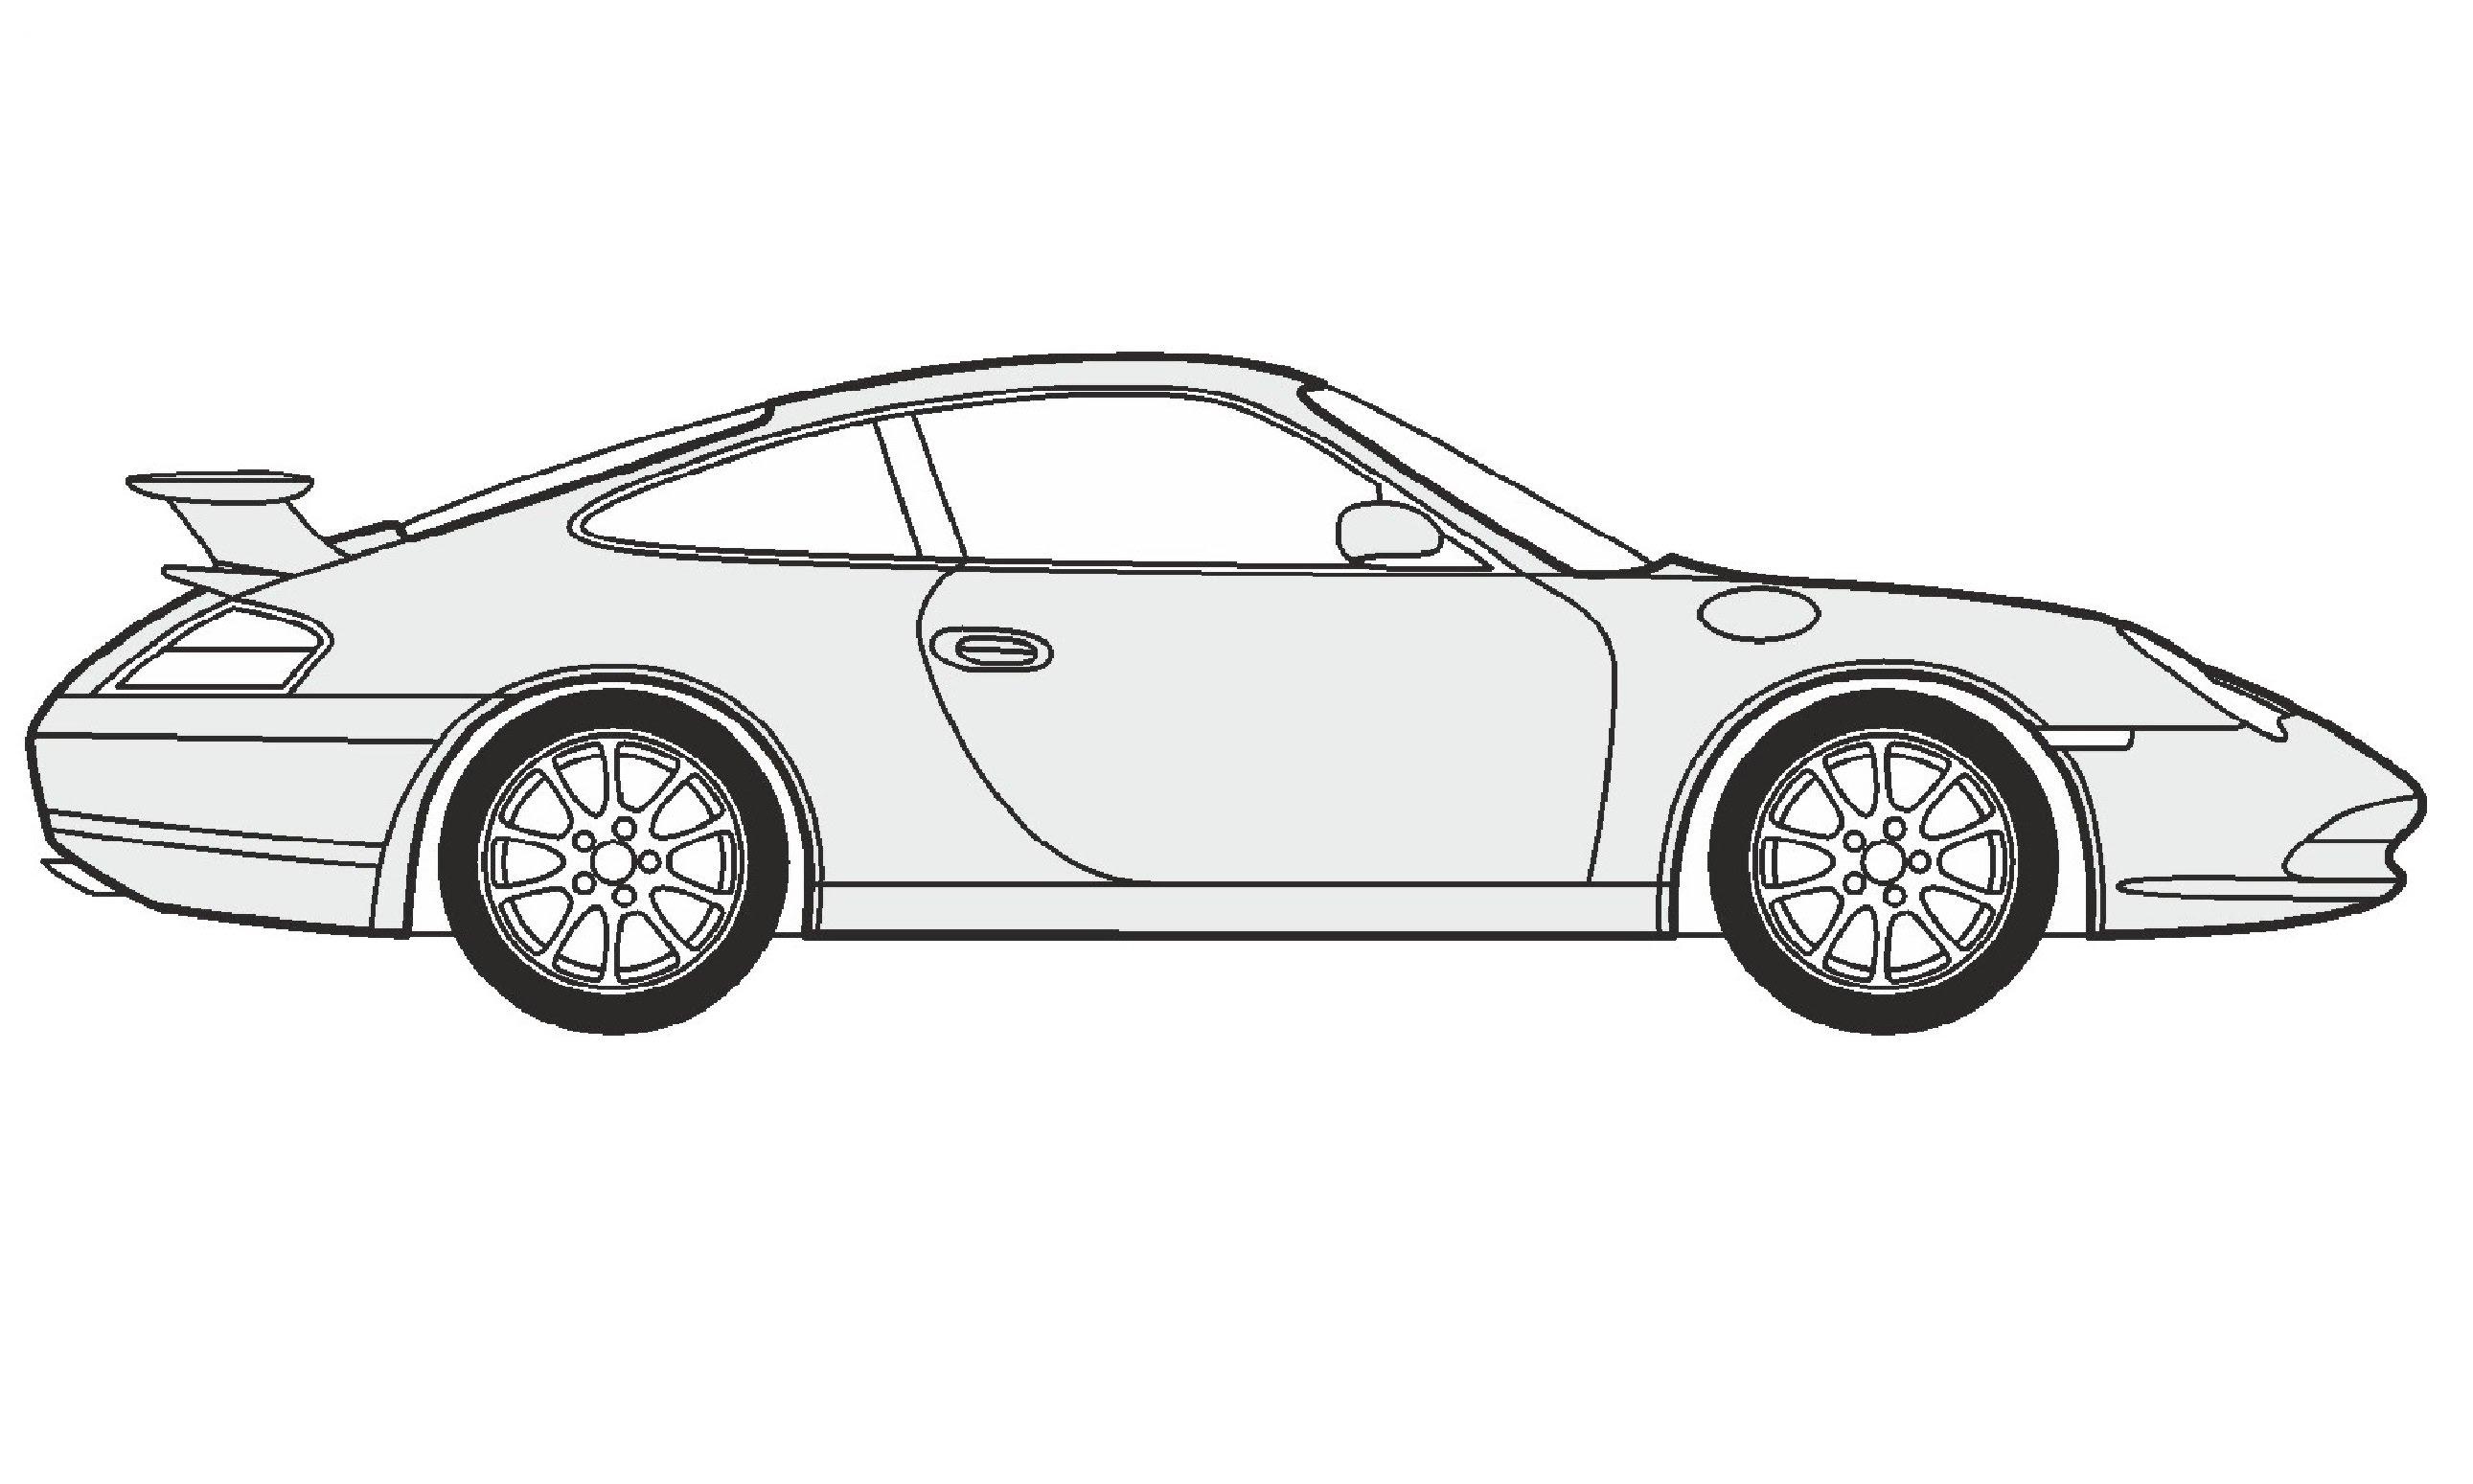 Drawn vehicle porsche 911 Porsche / GT3 GT3 нарисовать